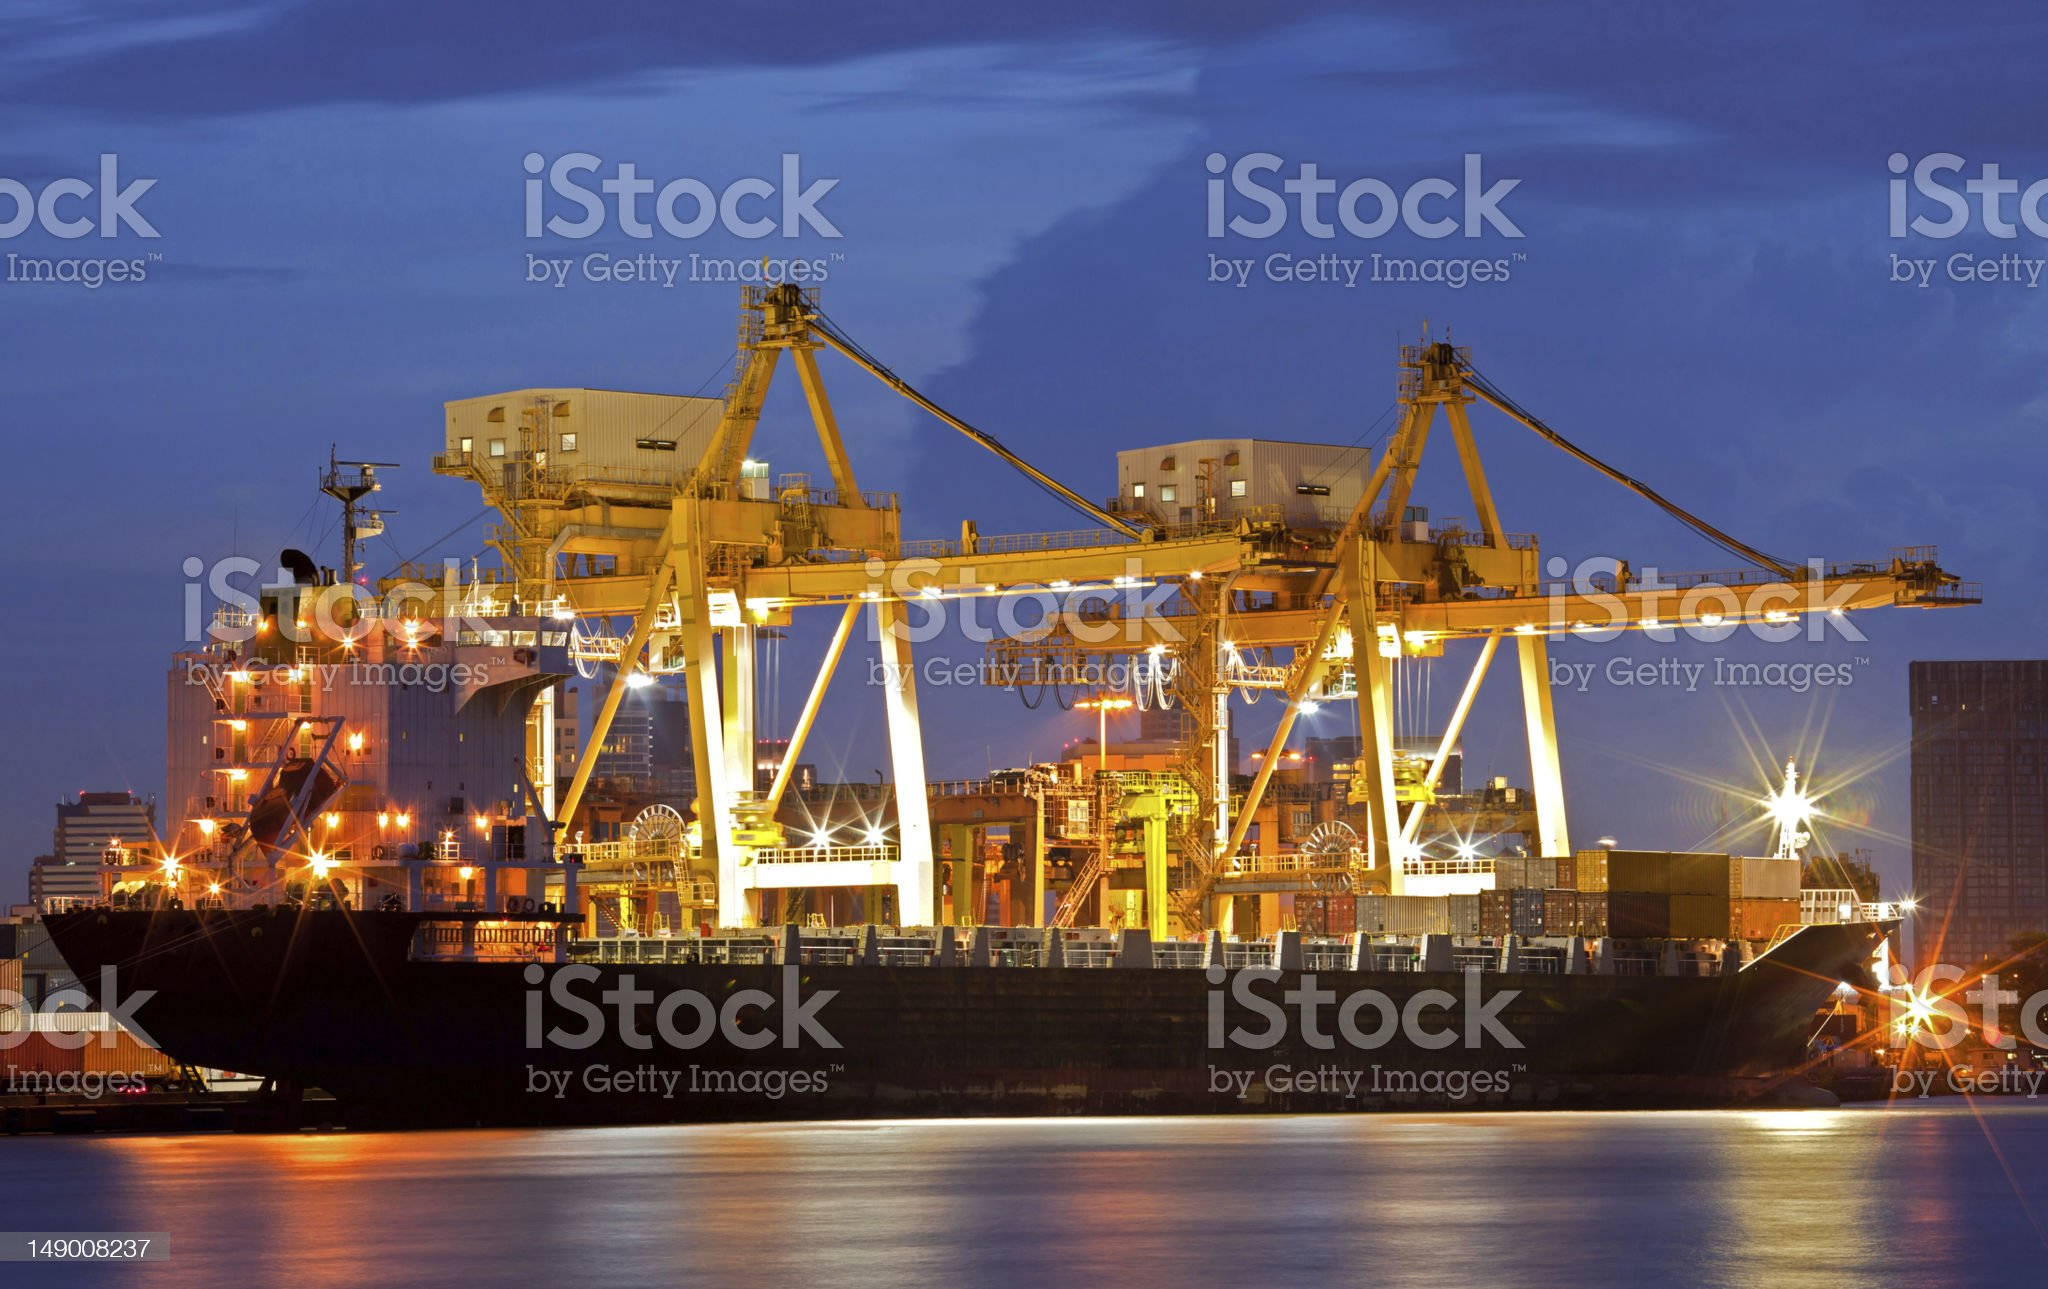 Cargo Ships at dusk royalty-free stock photo